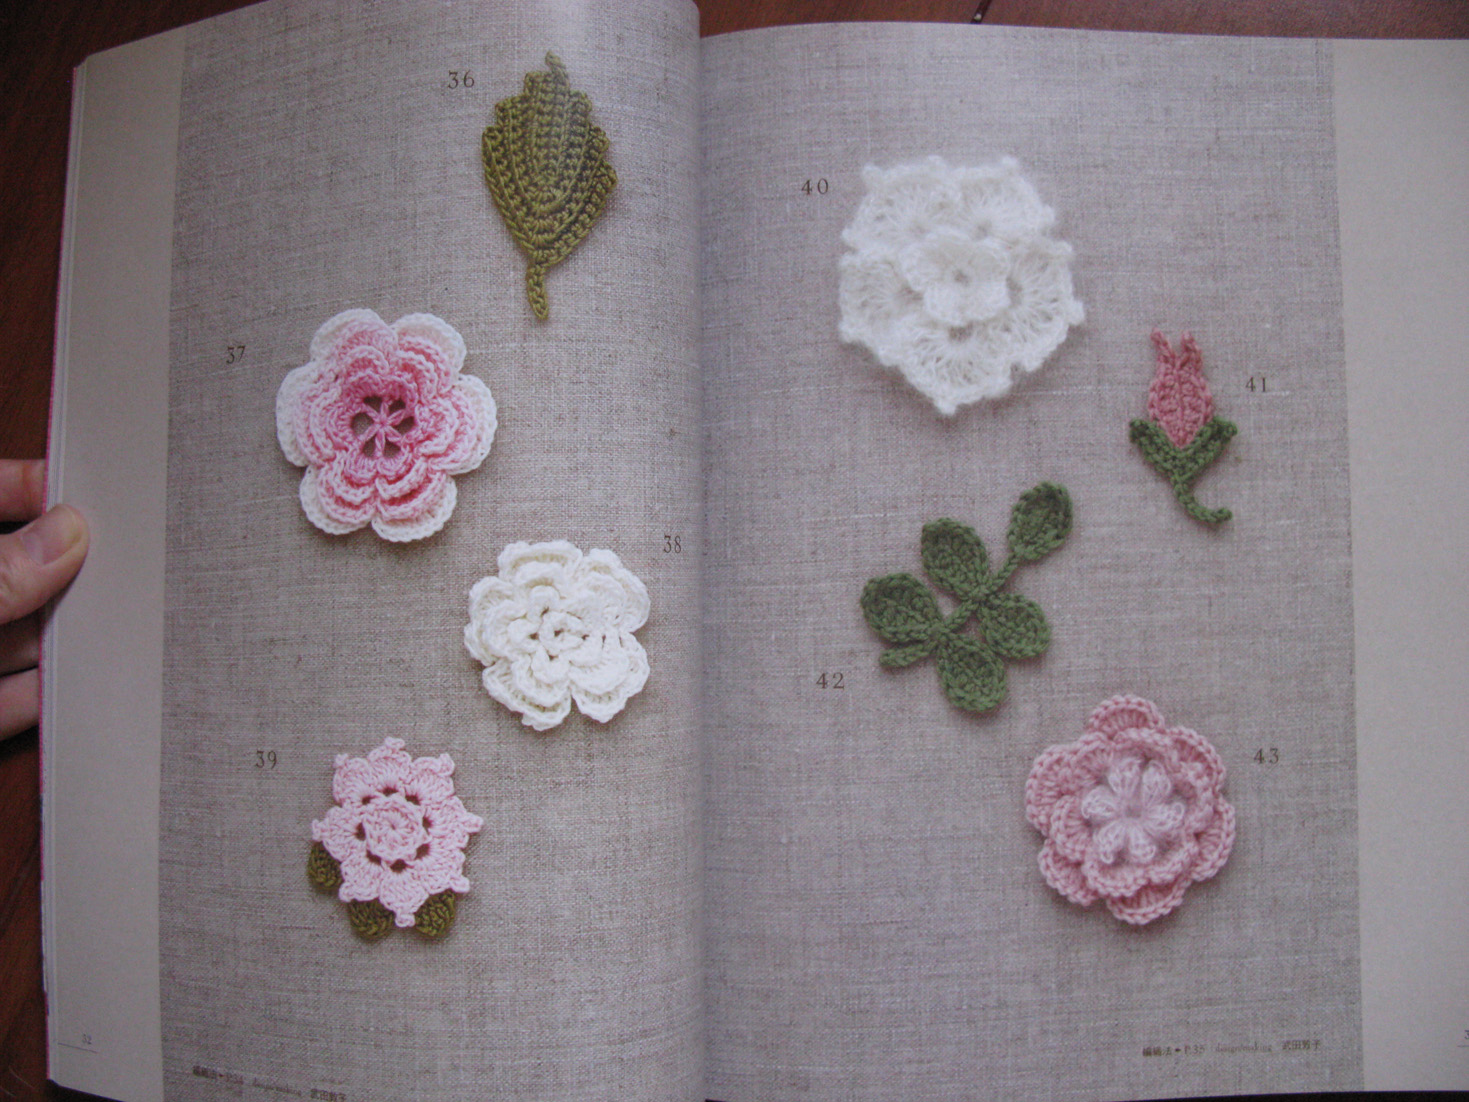 Japanese Crochet Books In English Picsbud